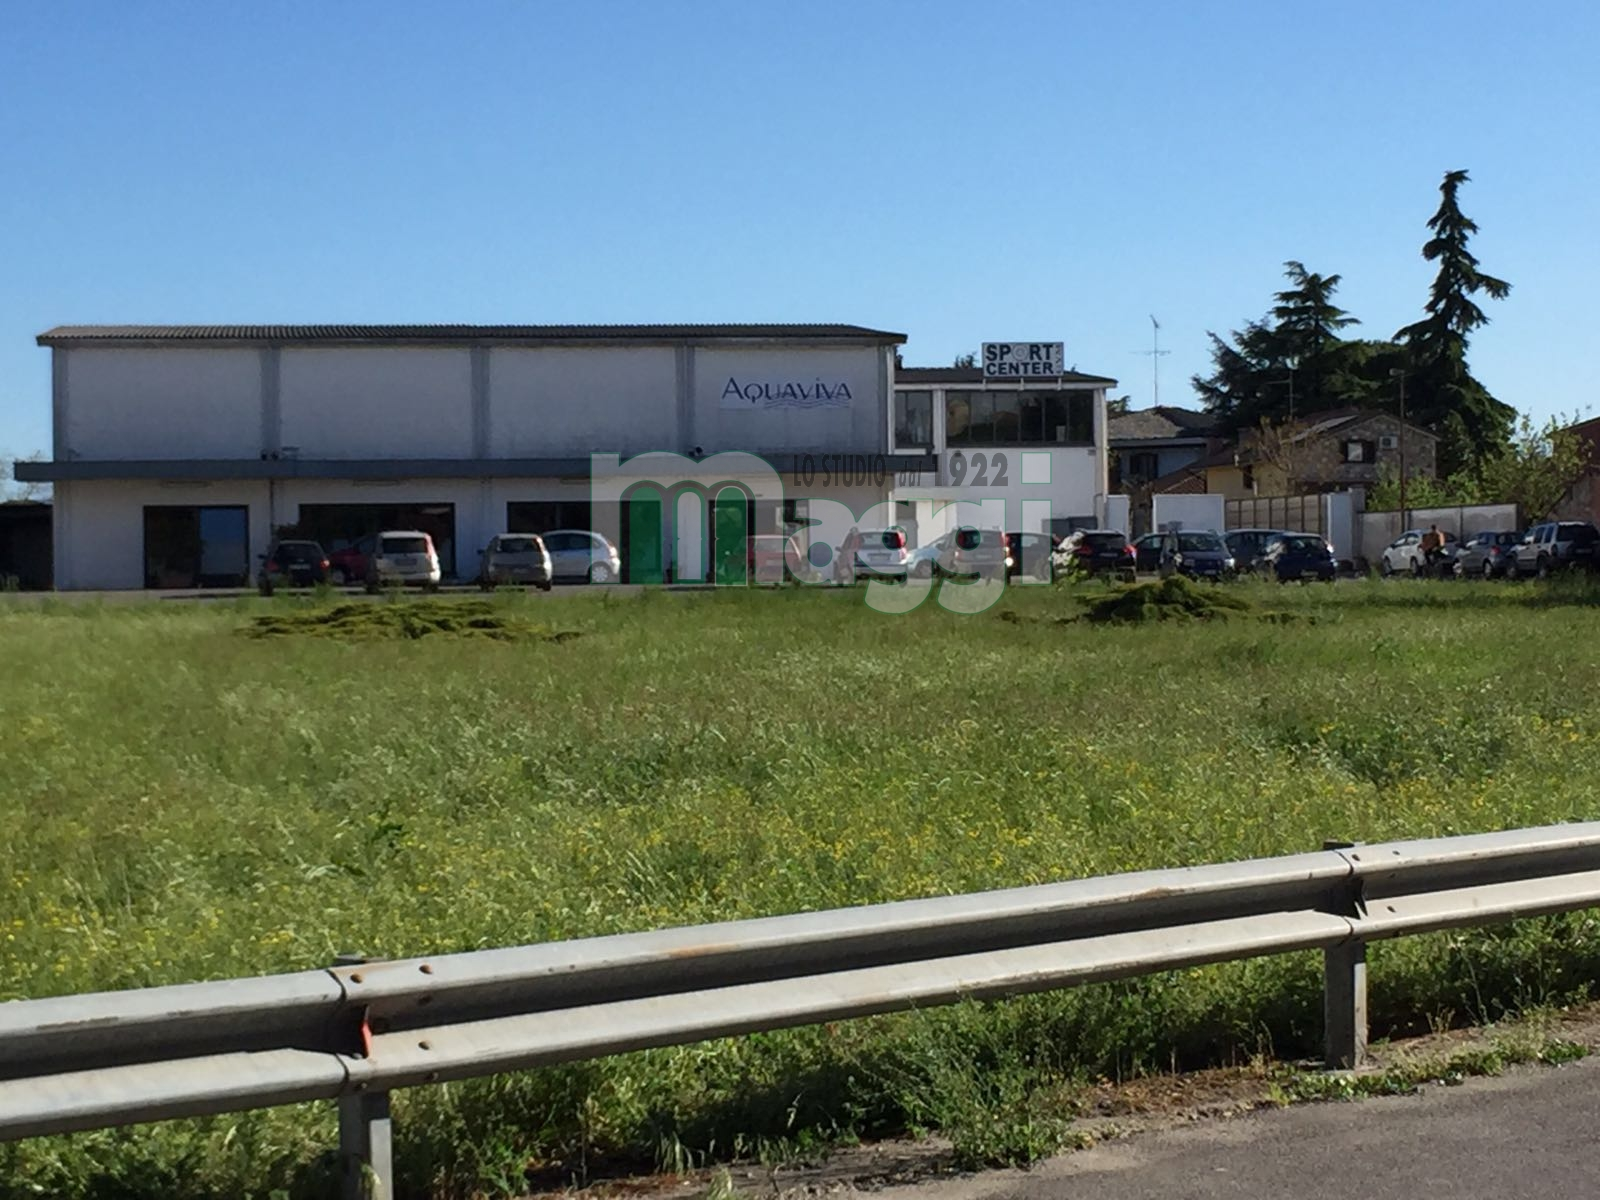 Terreno residenziale in Vendita a Voghera: 10000 mq  - Foto 1